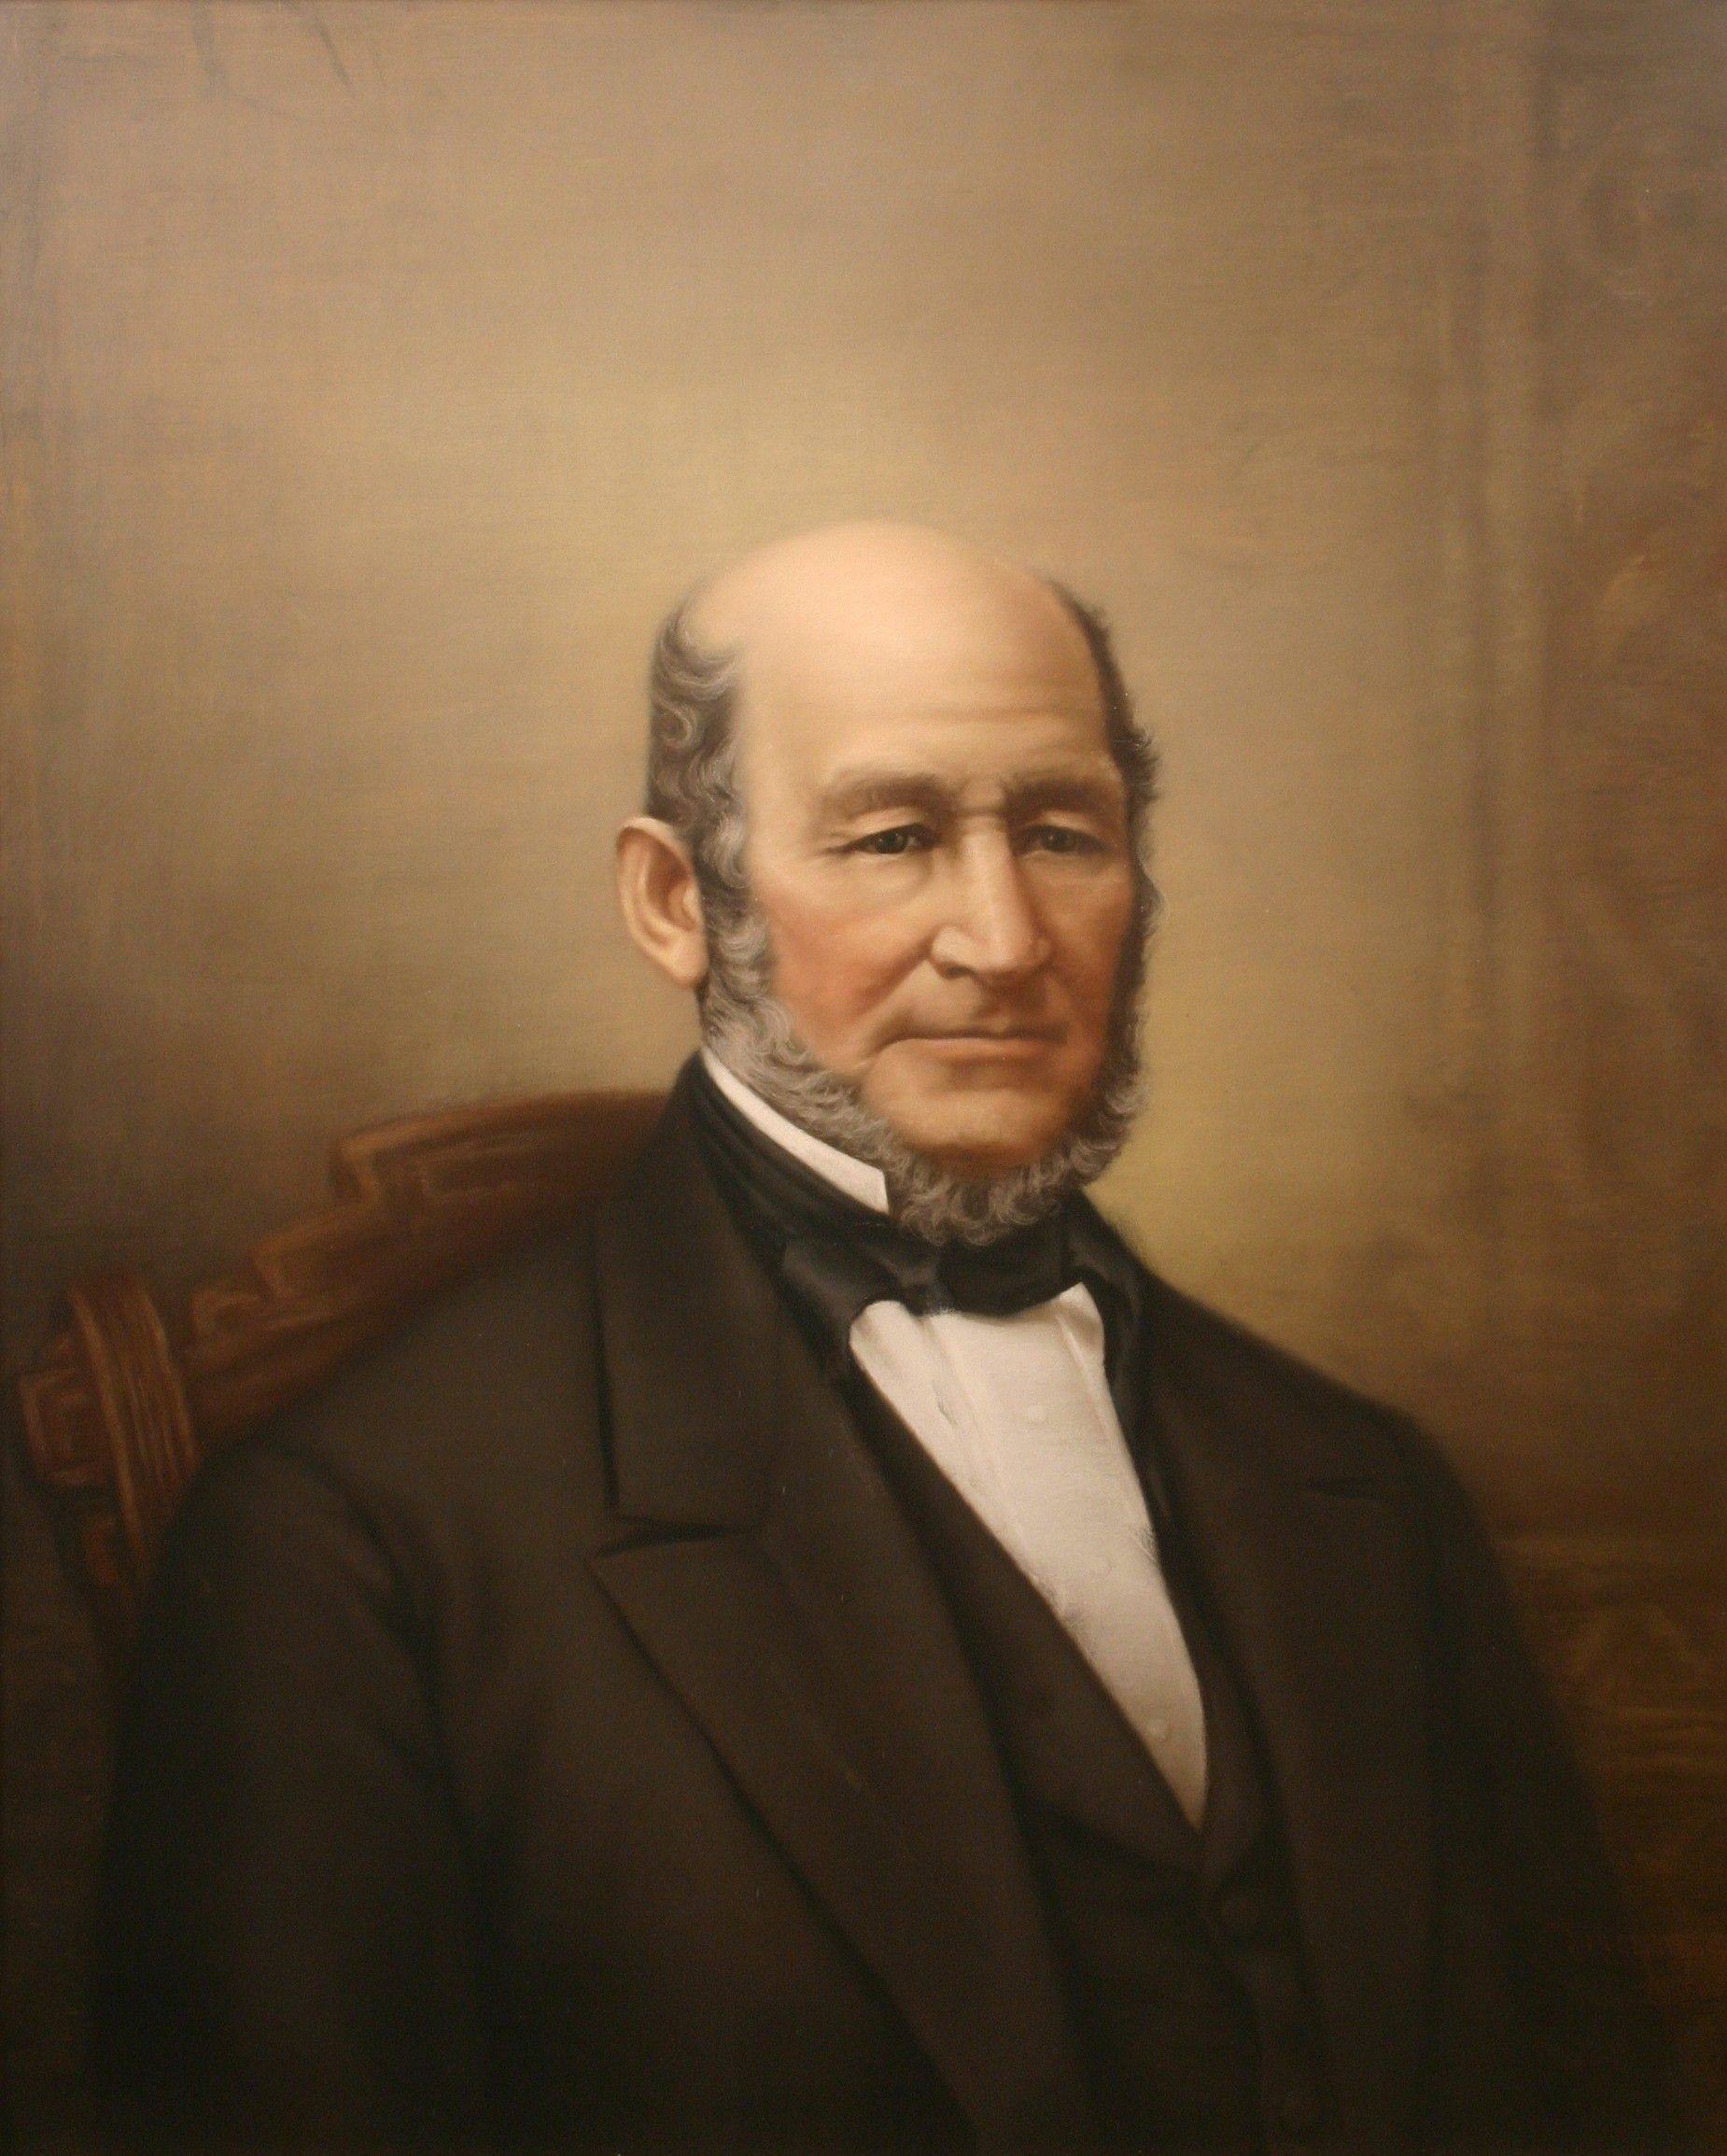 Heber C. Kimball, by John Willard Clawson